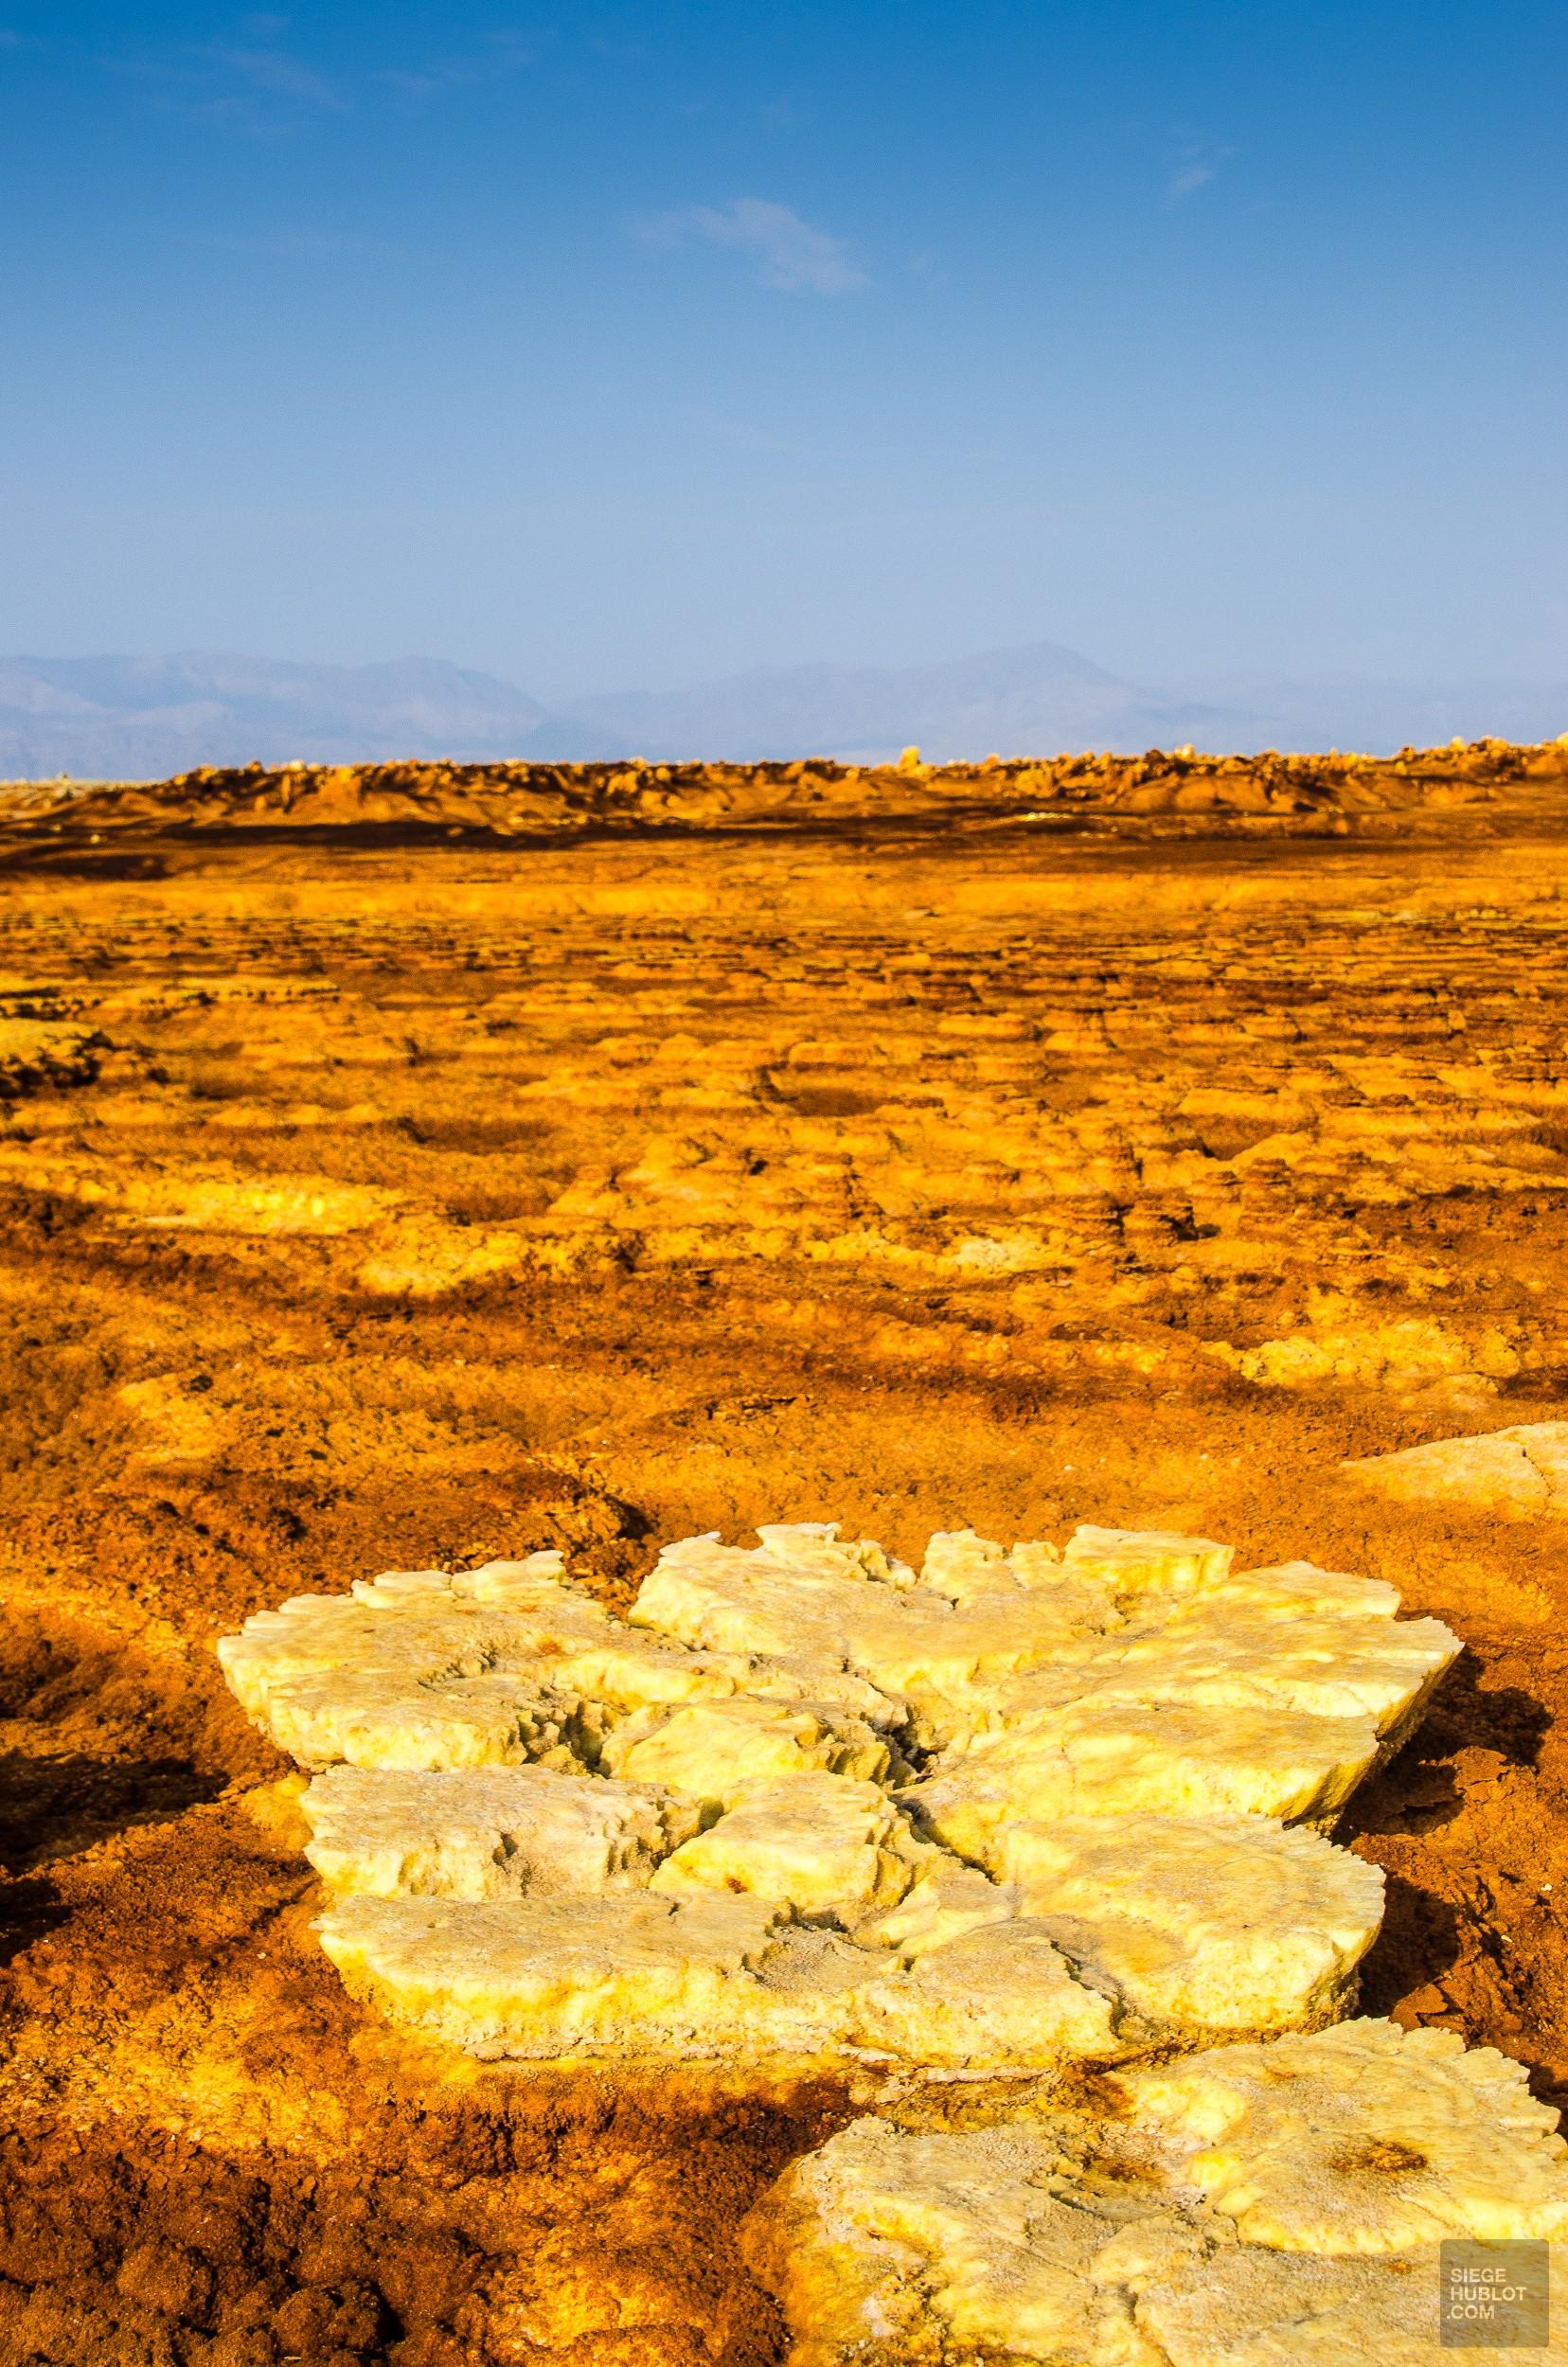 champignon sel - Dallol - Visiter une autre planete: Danakil, Ethiopie - afrique, ethiopie